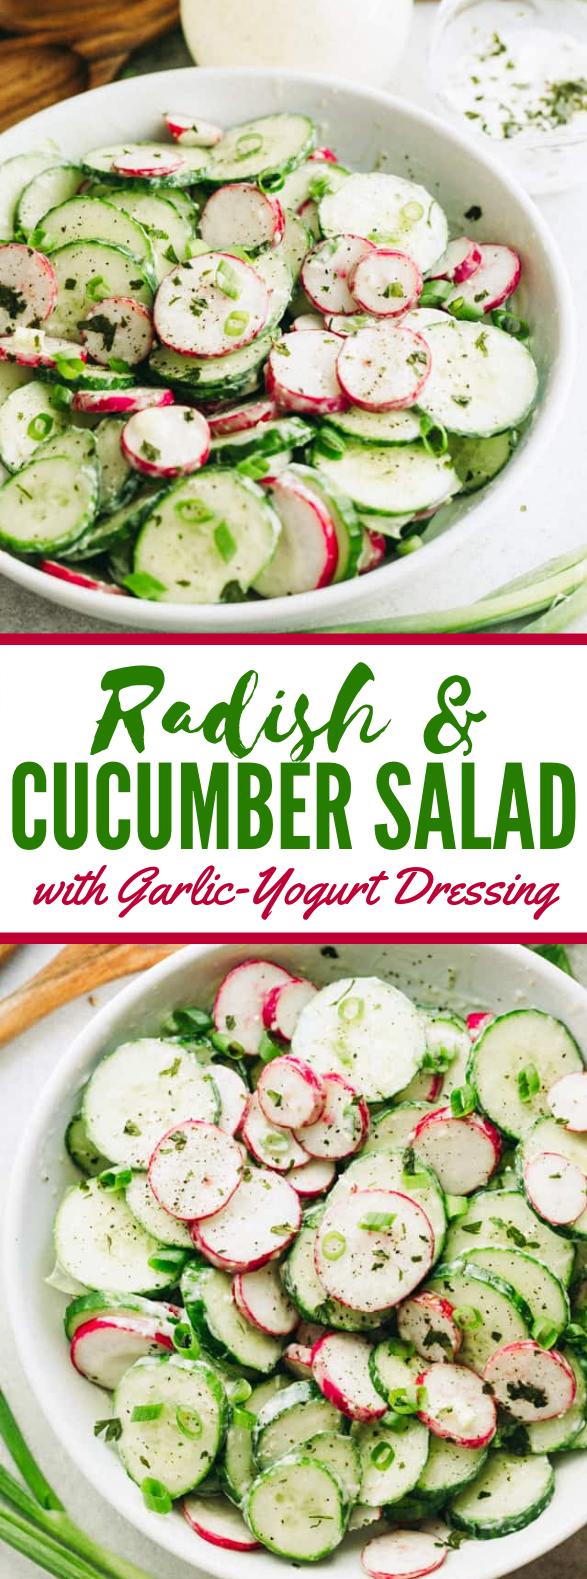 Radish and Cucumber Salad with Garlic-Yogurt Dressing #vegetarian #diet